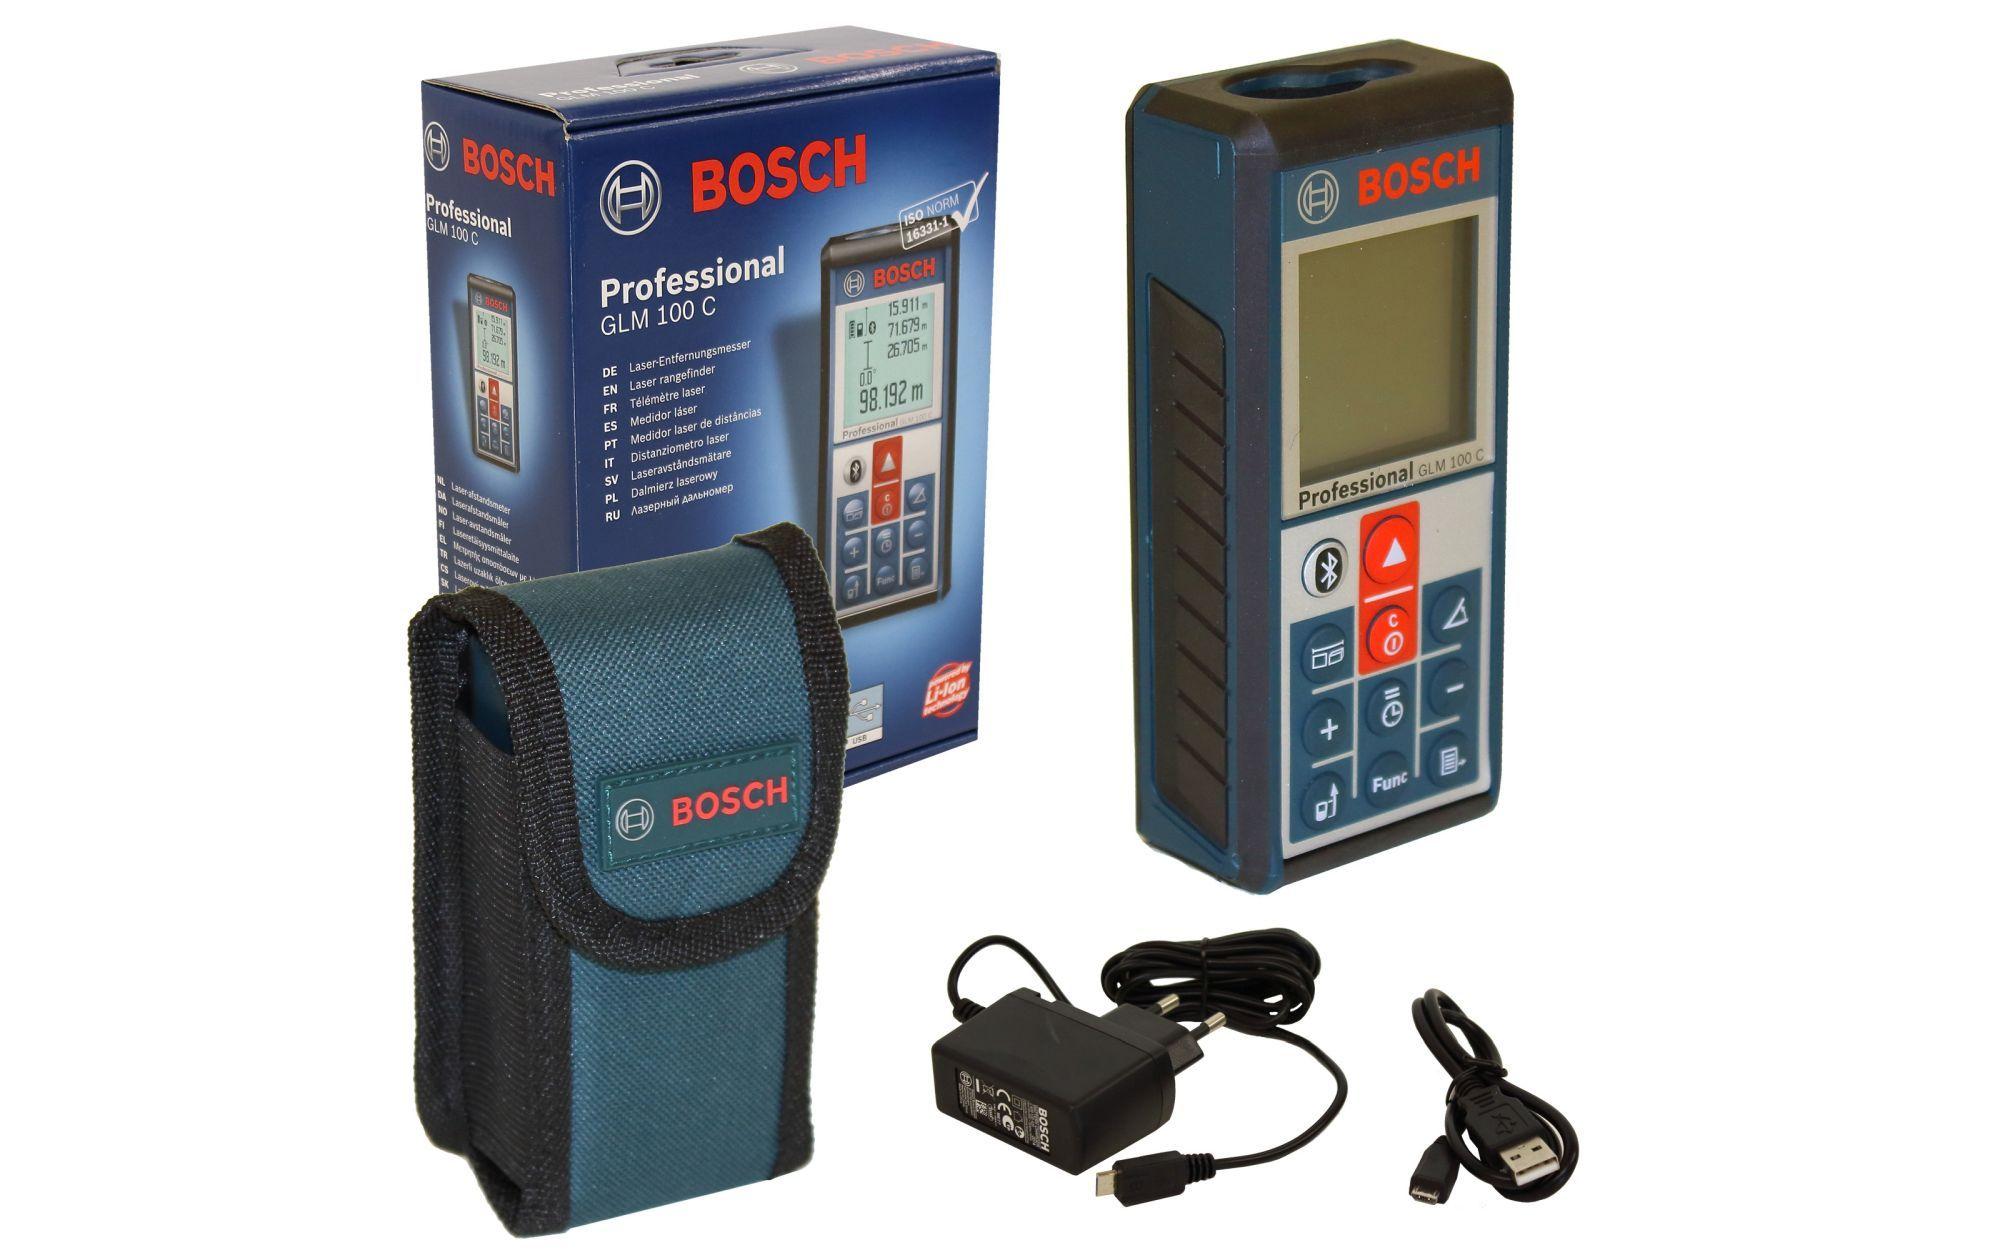 Laser Entfernungsmesser Glm 100 C Professional : ▷ recensione bosch glm 100 c qualescegliere.it